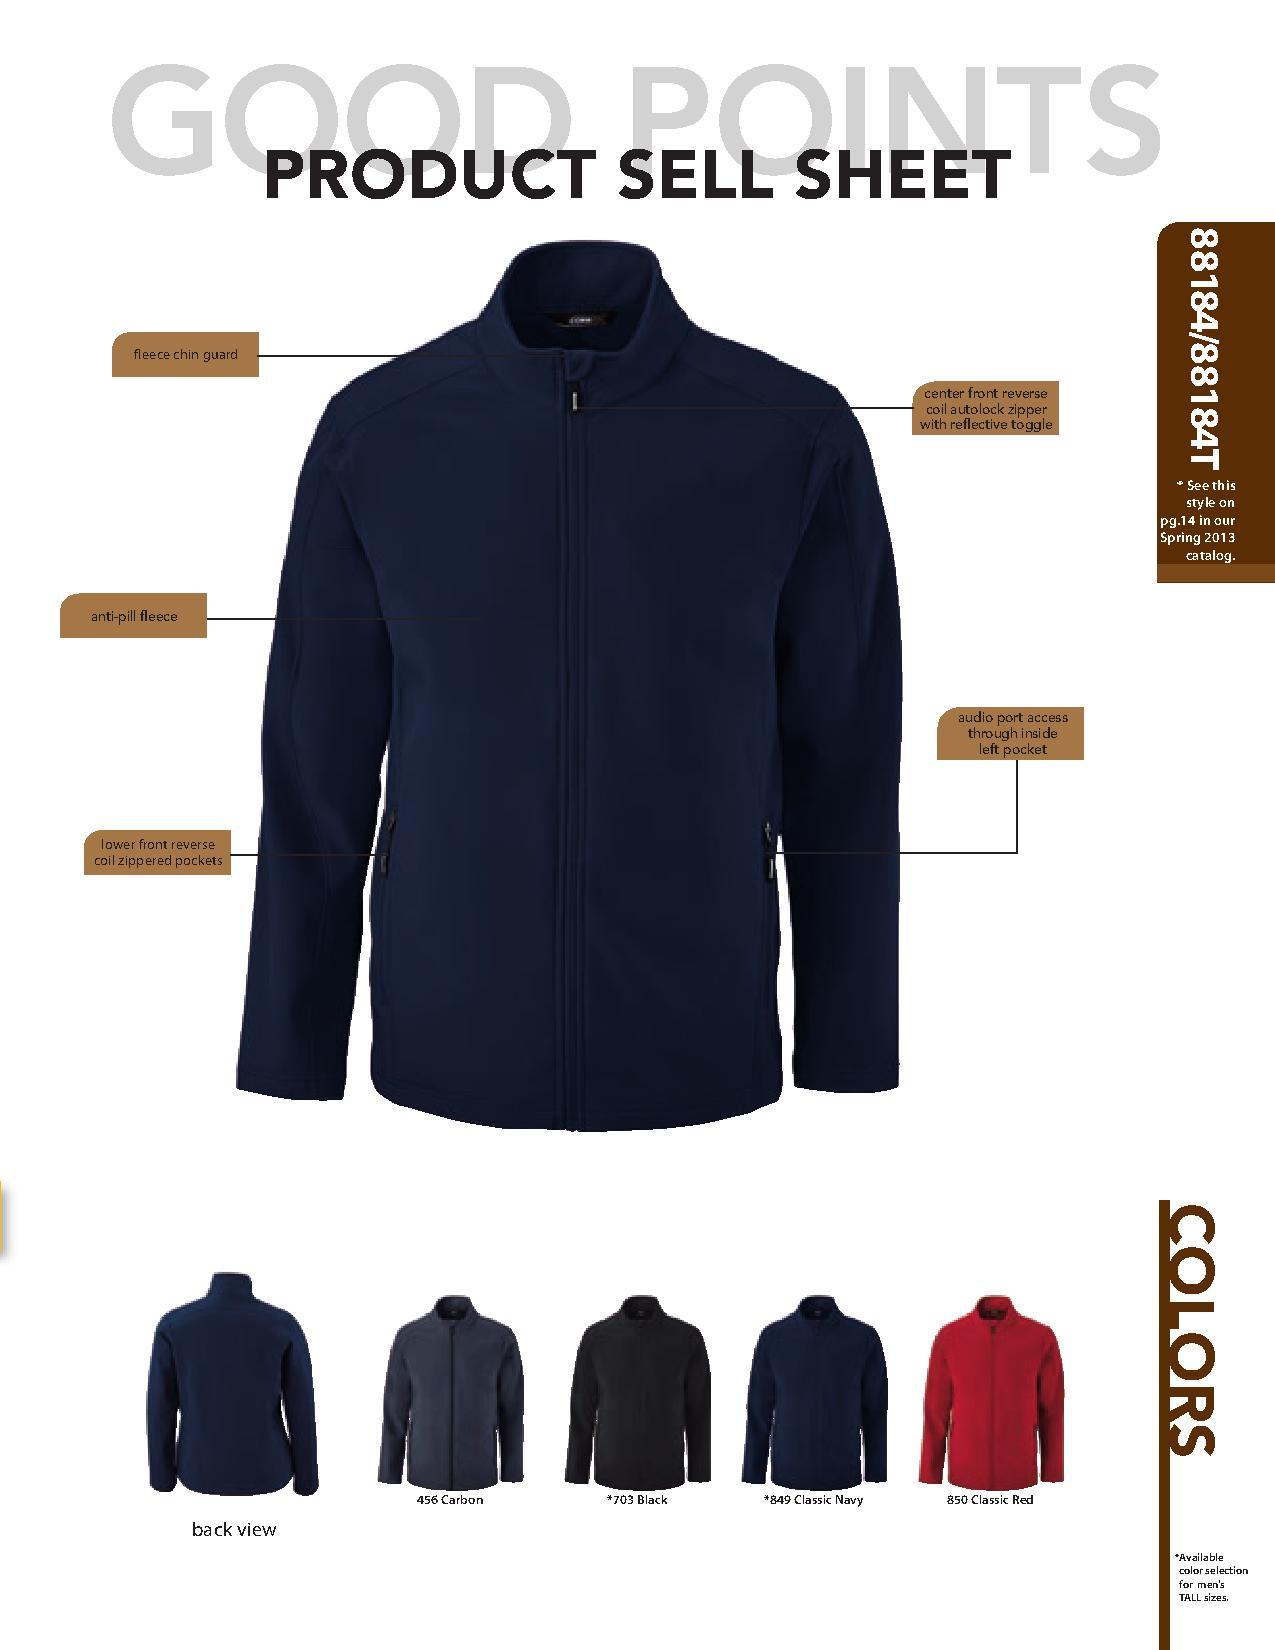 Ash City Core365 88184 - Cruise Core365 Men's 2-Layer Fleece Bonded Soft Shell Jacket